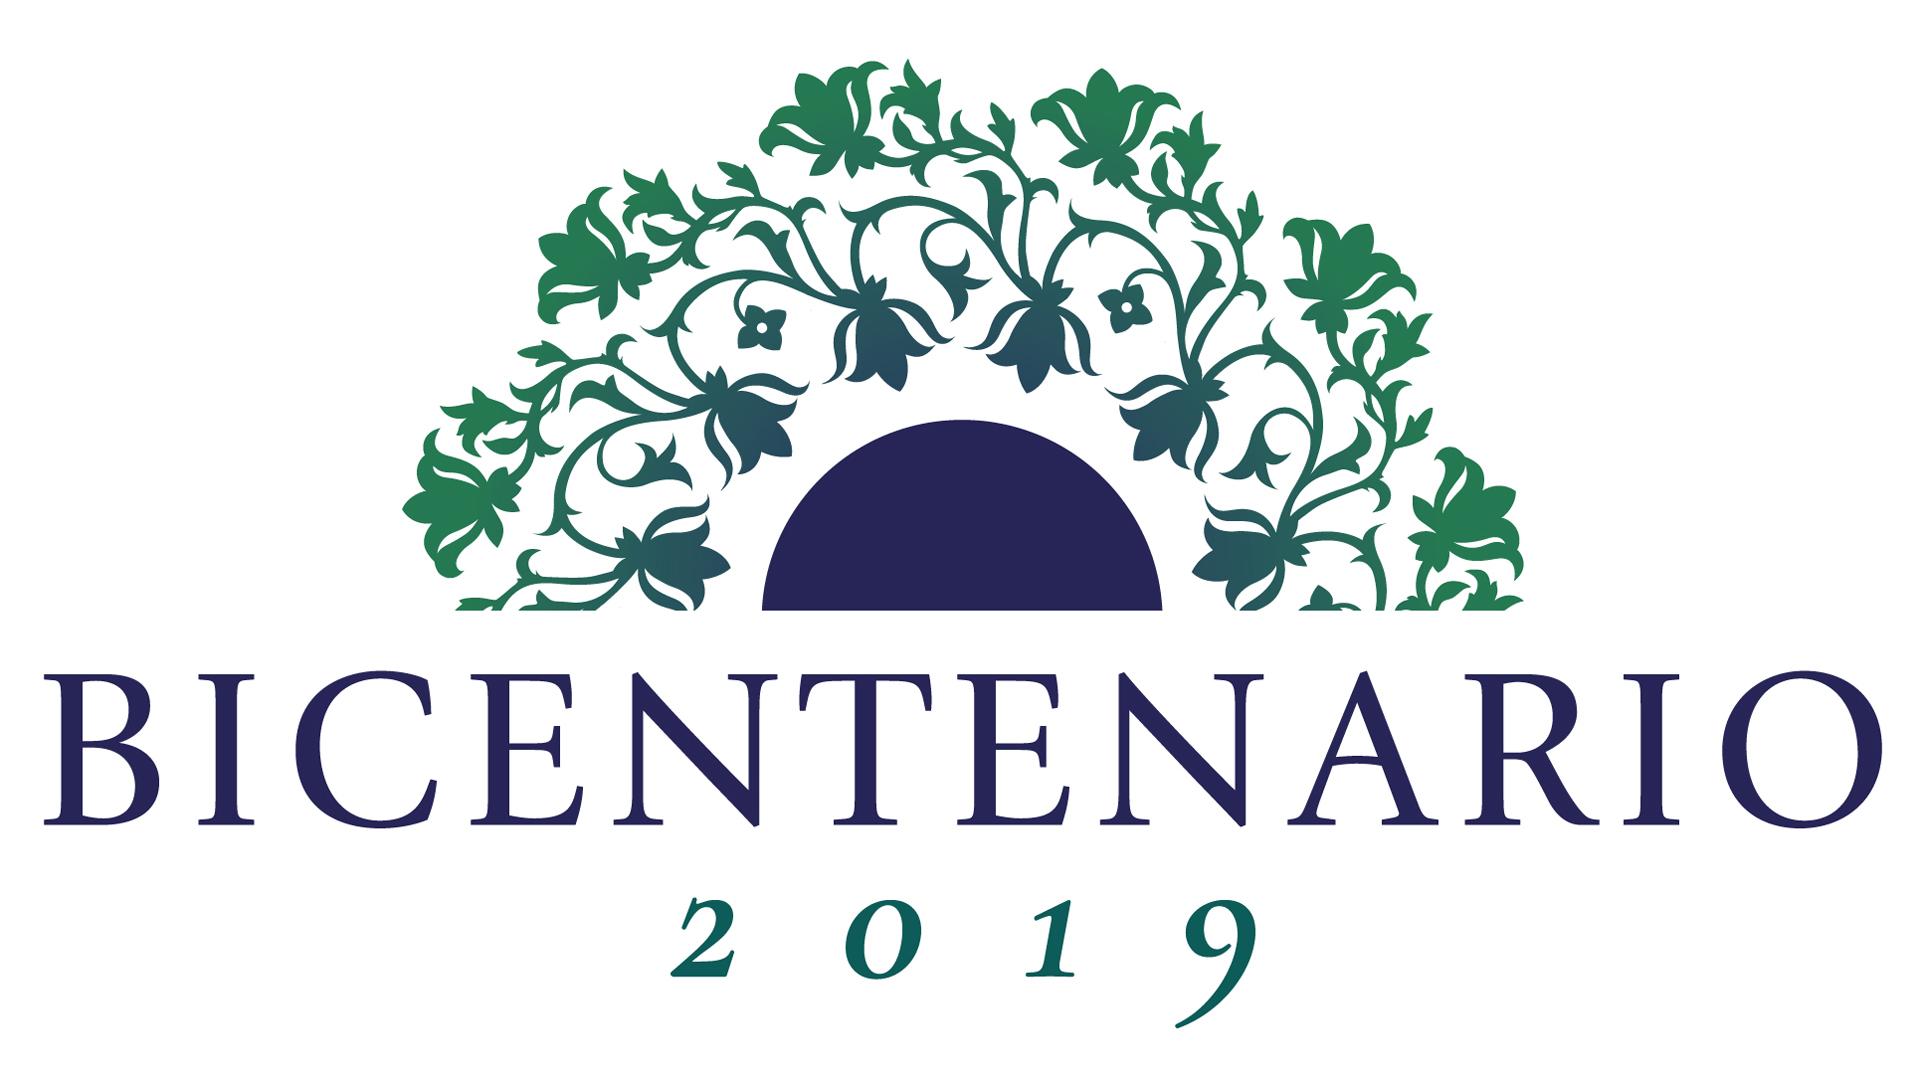 bicentenary icon